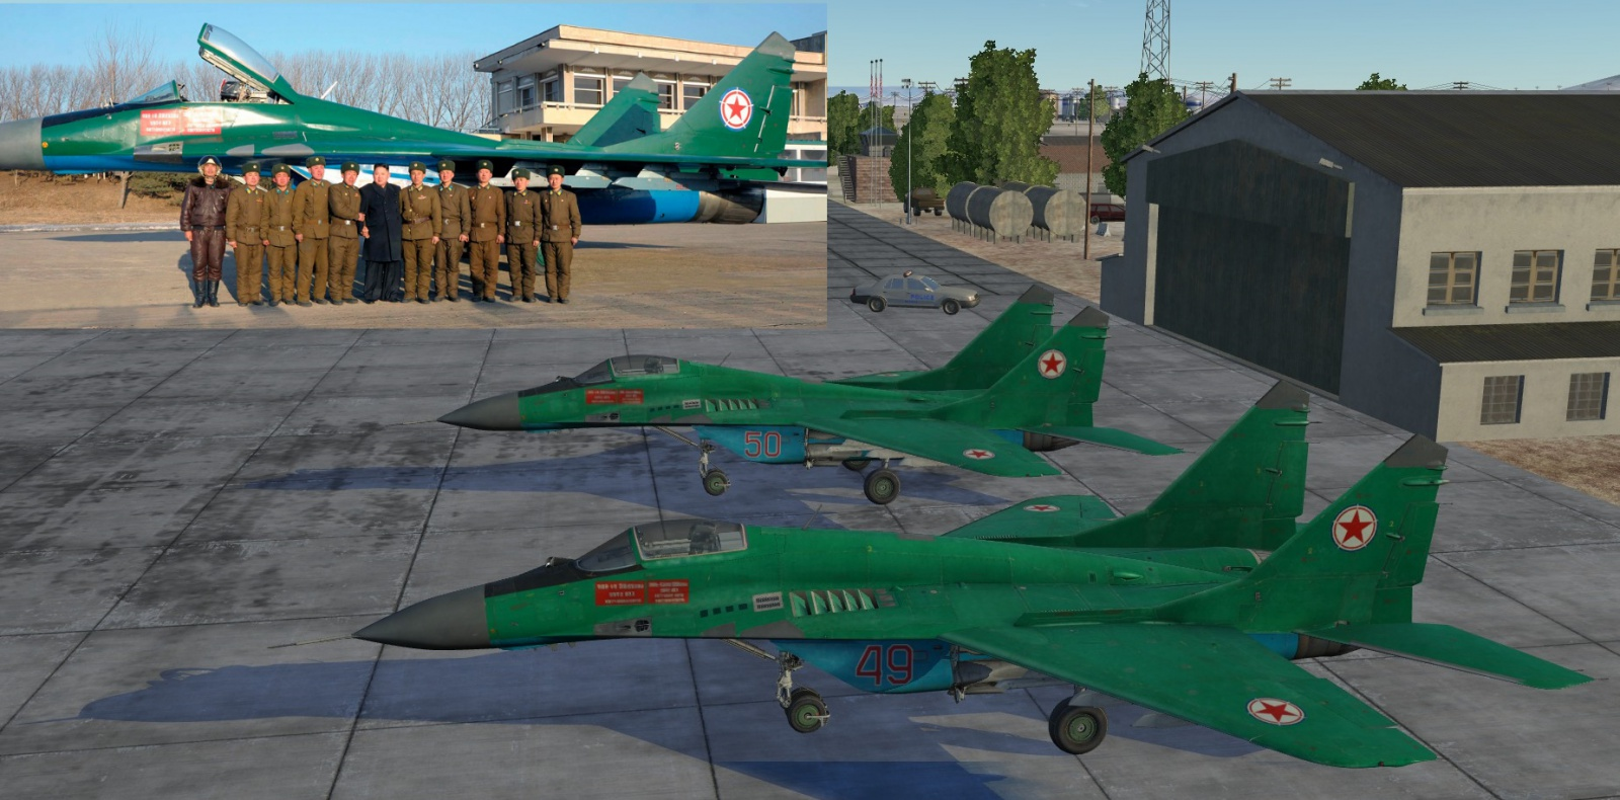 MiG-29 moi la loai may bay duoc xuat khau nhieu nhat cua Nga-Hinh-18